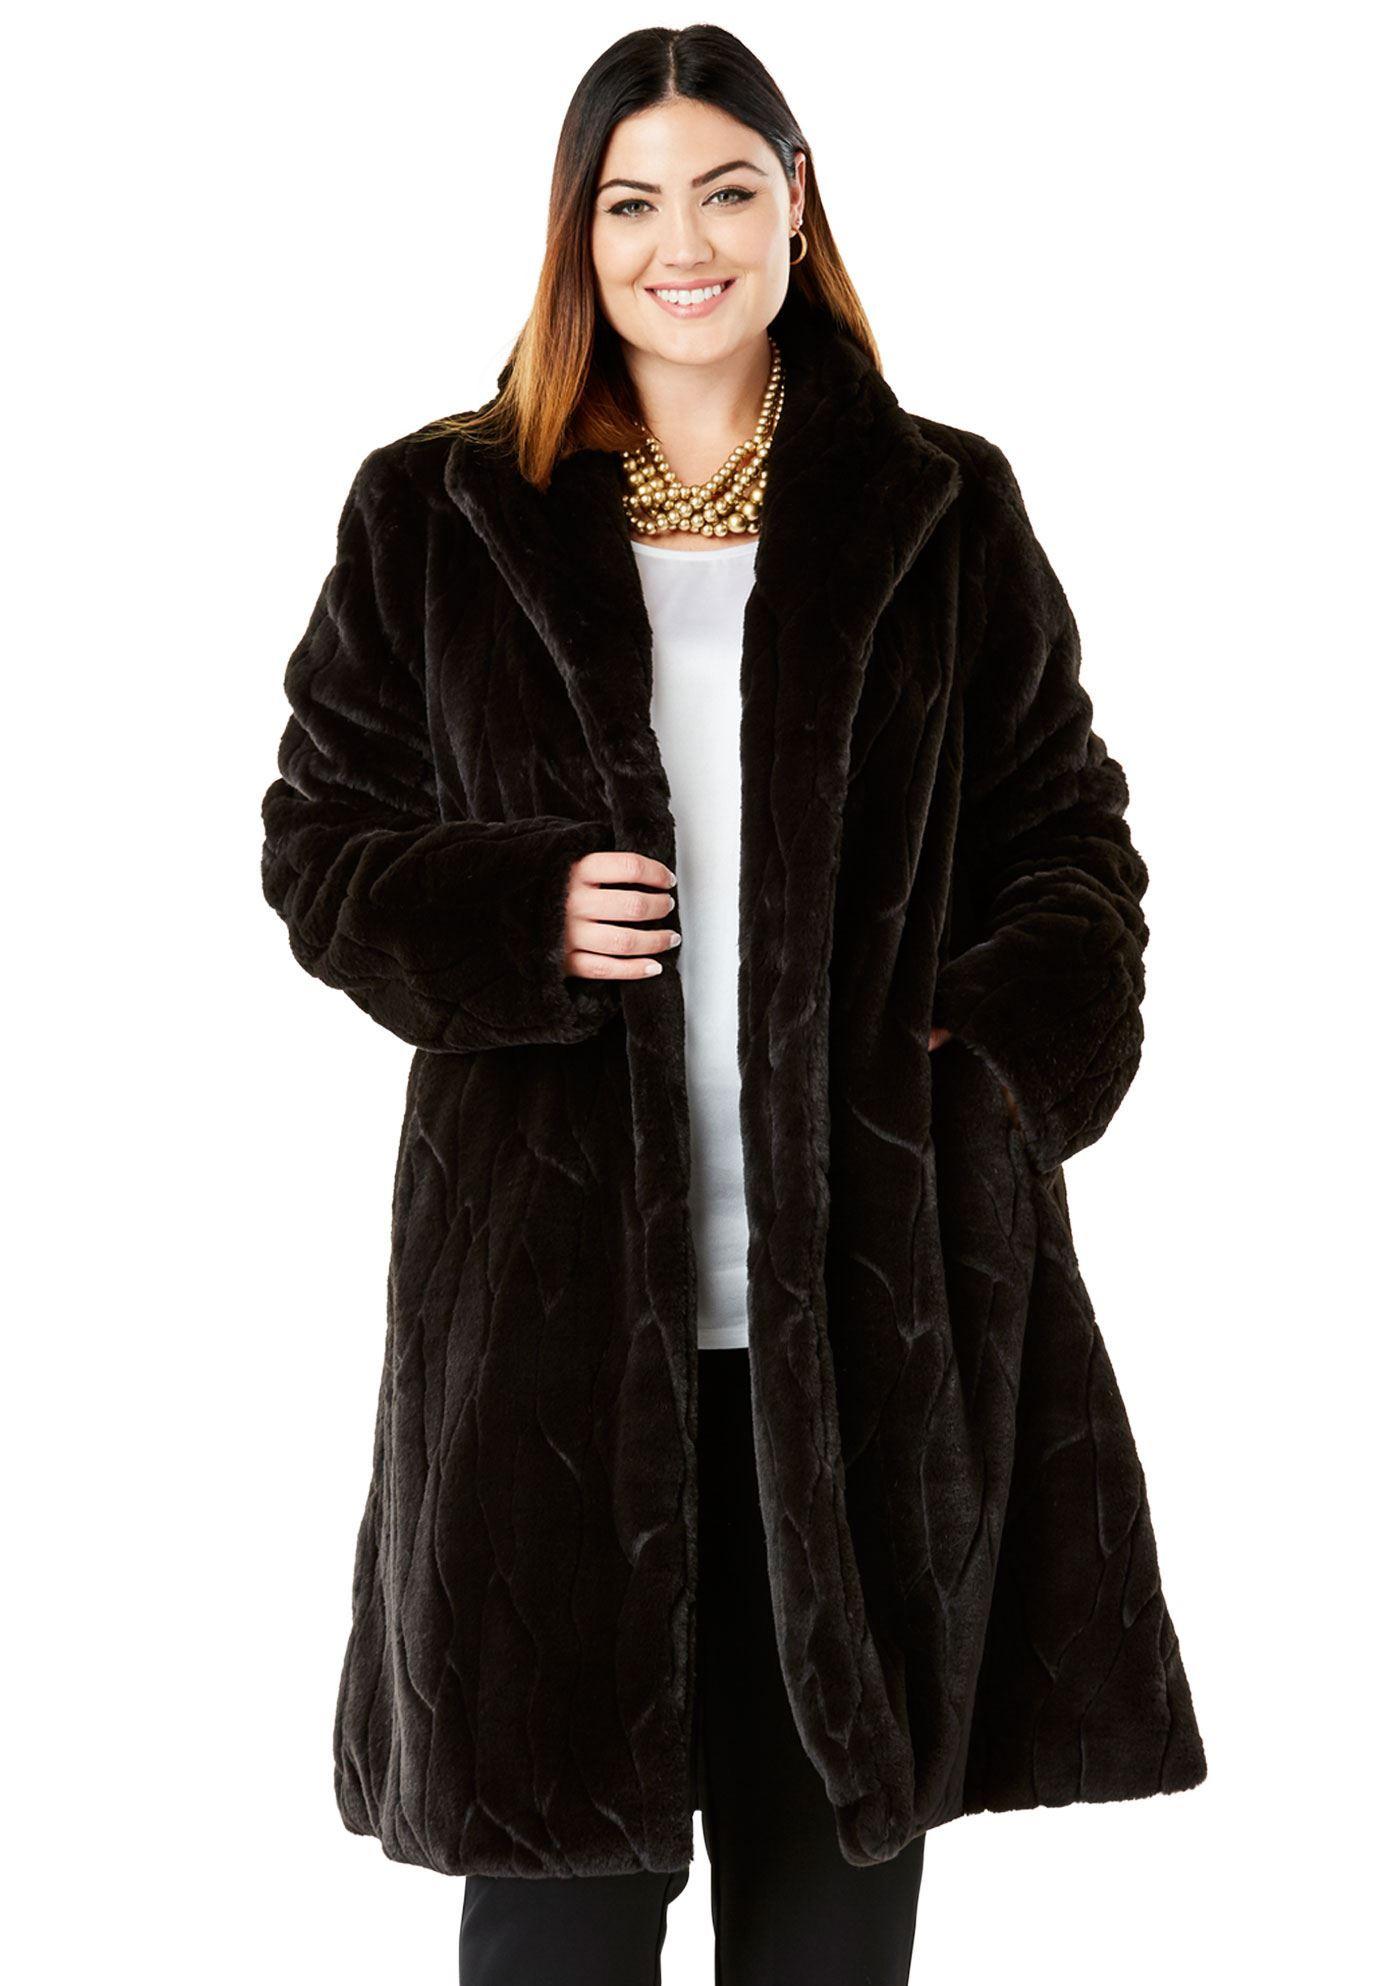 Faux Fur Swing Coat Women S Plus Size Clothing Faux Fur Swing Coat Faux Fur Shearling Coat Swing Coats [ 1986 x 1380 Pixel ]